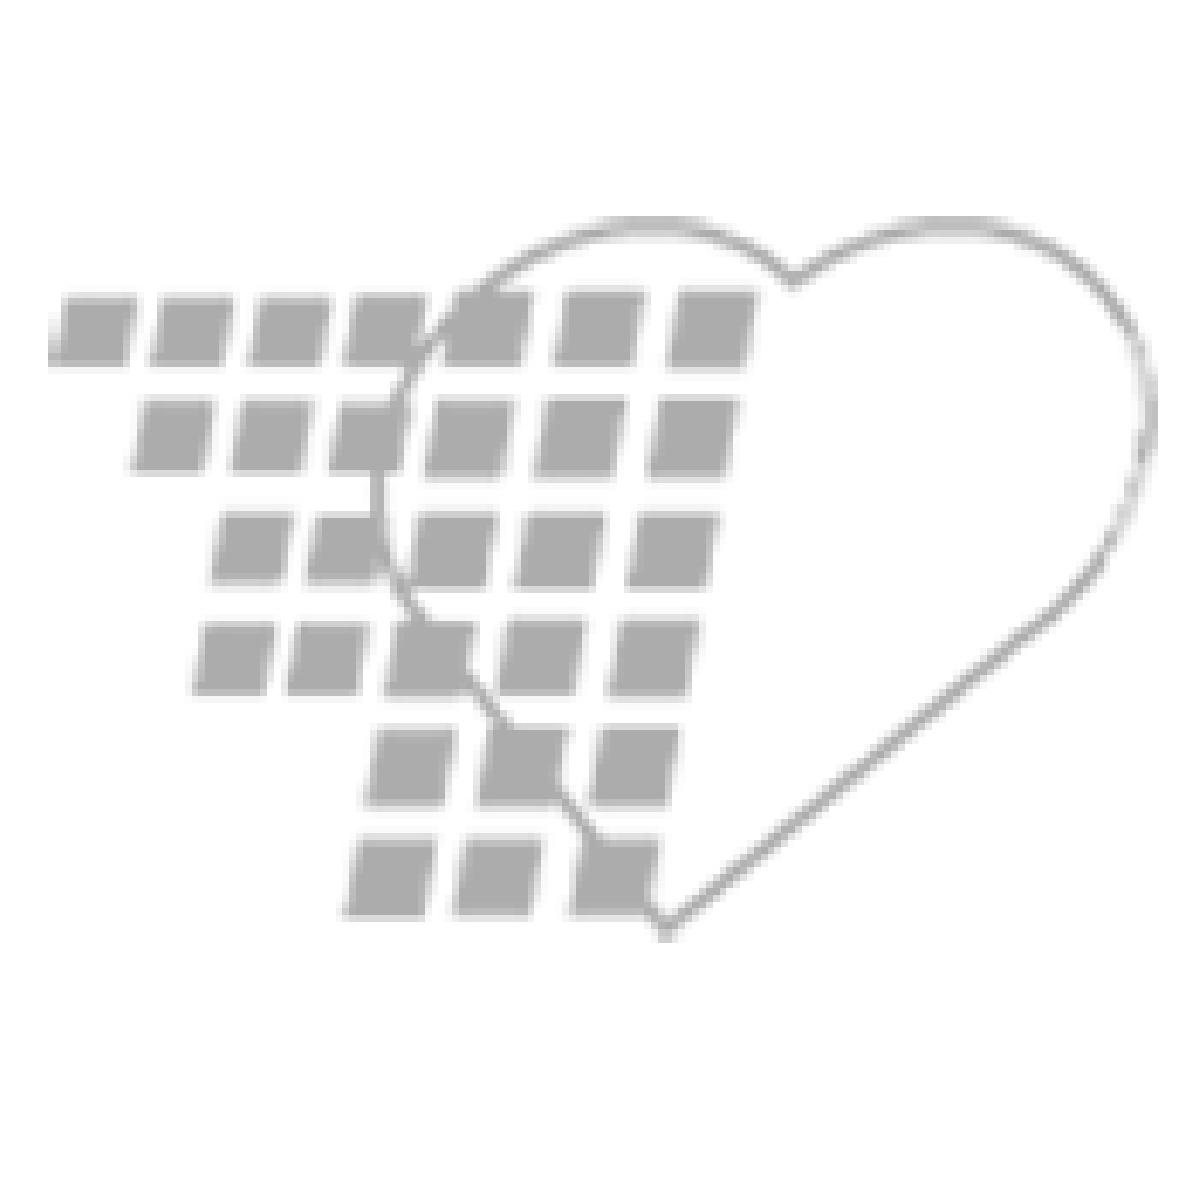 06-93-1050-1000ML - Demo Dose® 5% Dextros and  0.45% NaCl IV Fluid 1000mL